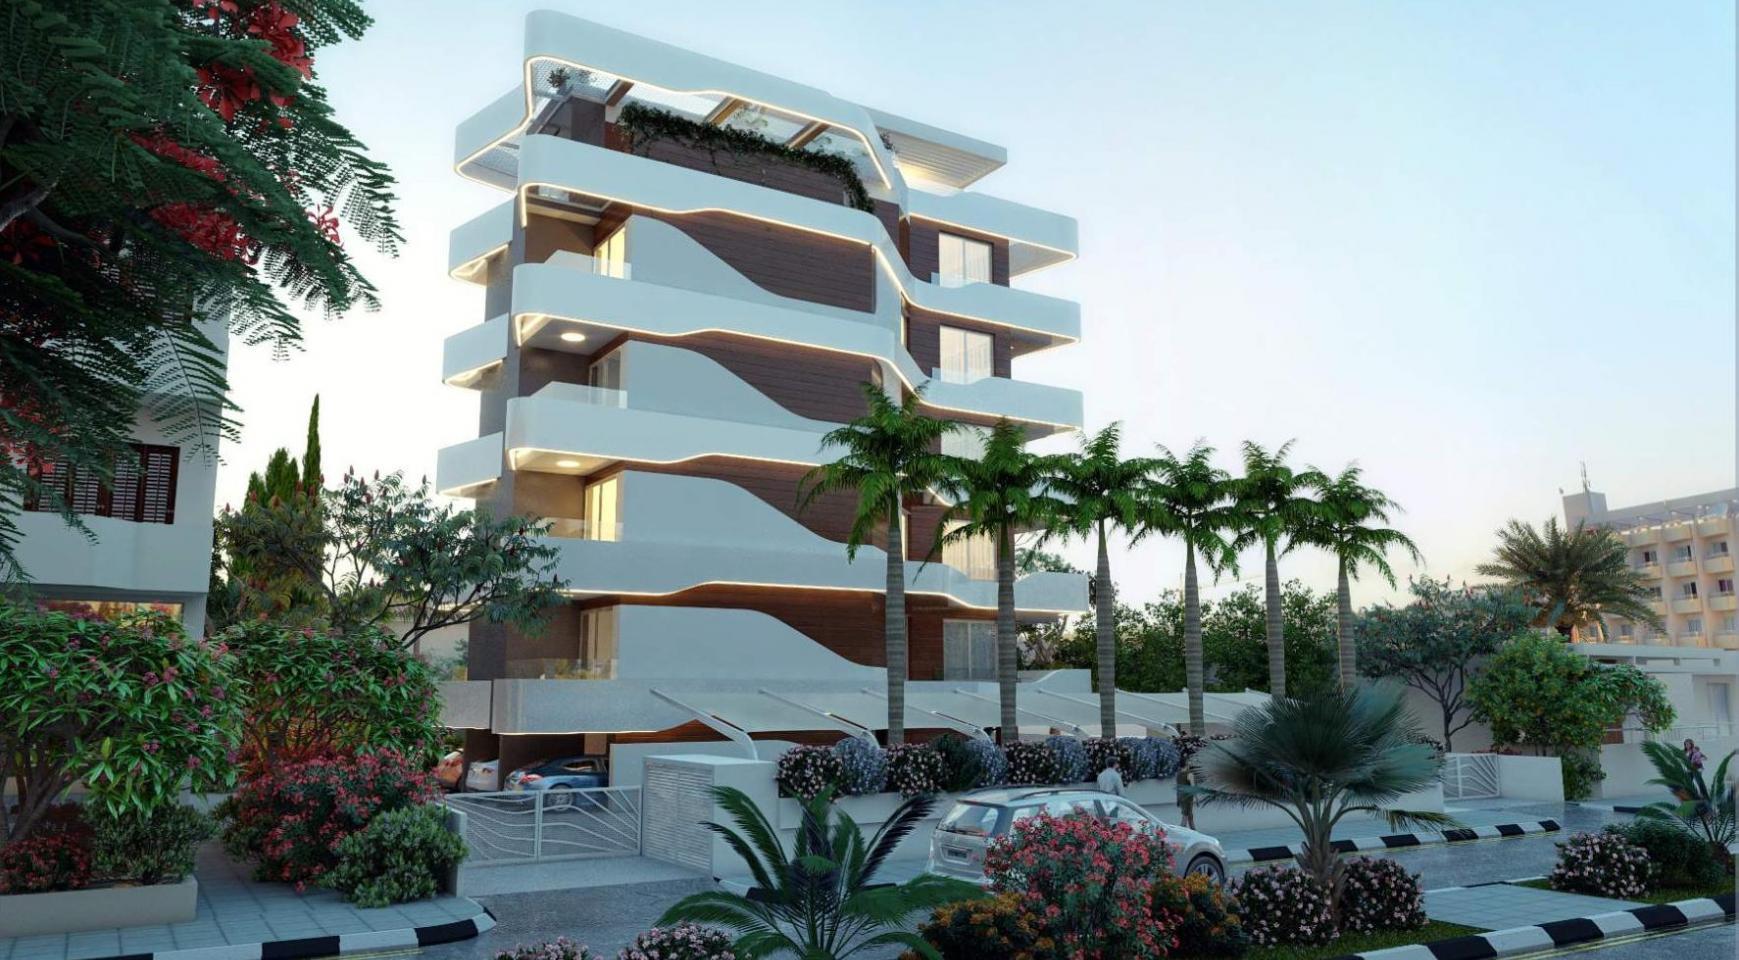 New 3 Bedroom Apartment in a Contemporary Complex near the Sea - 2